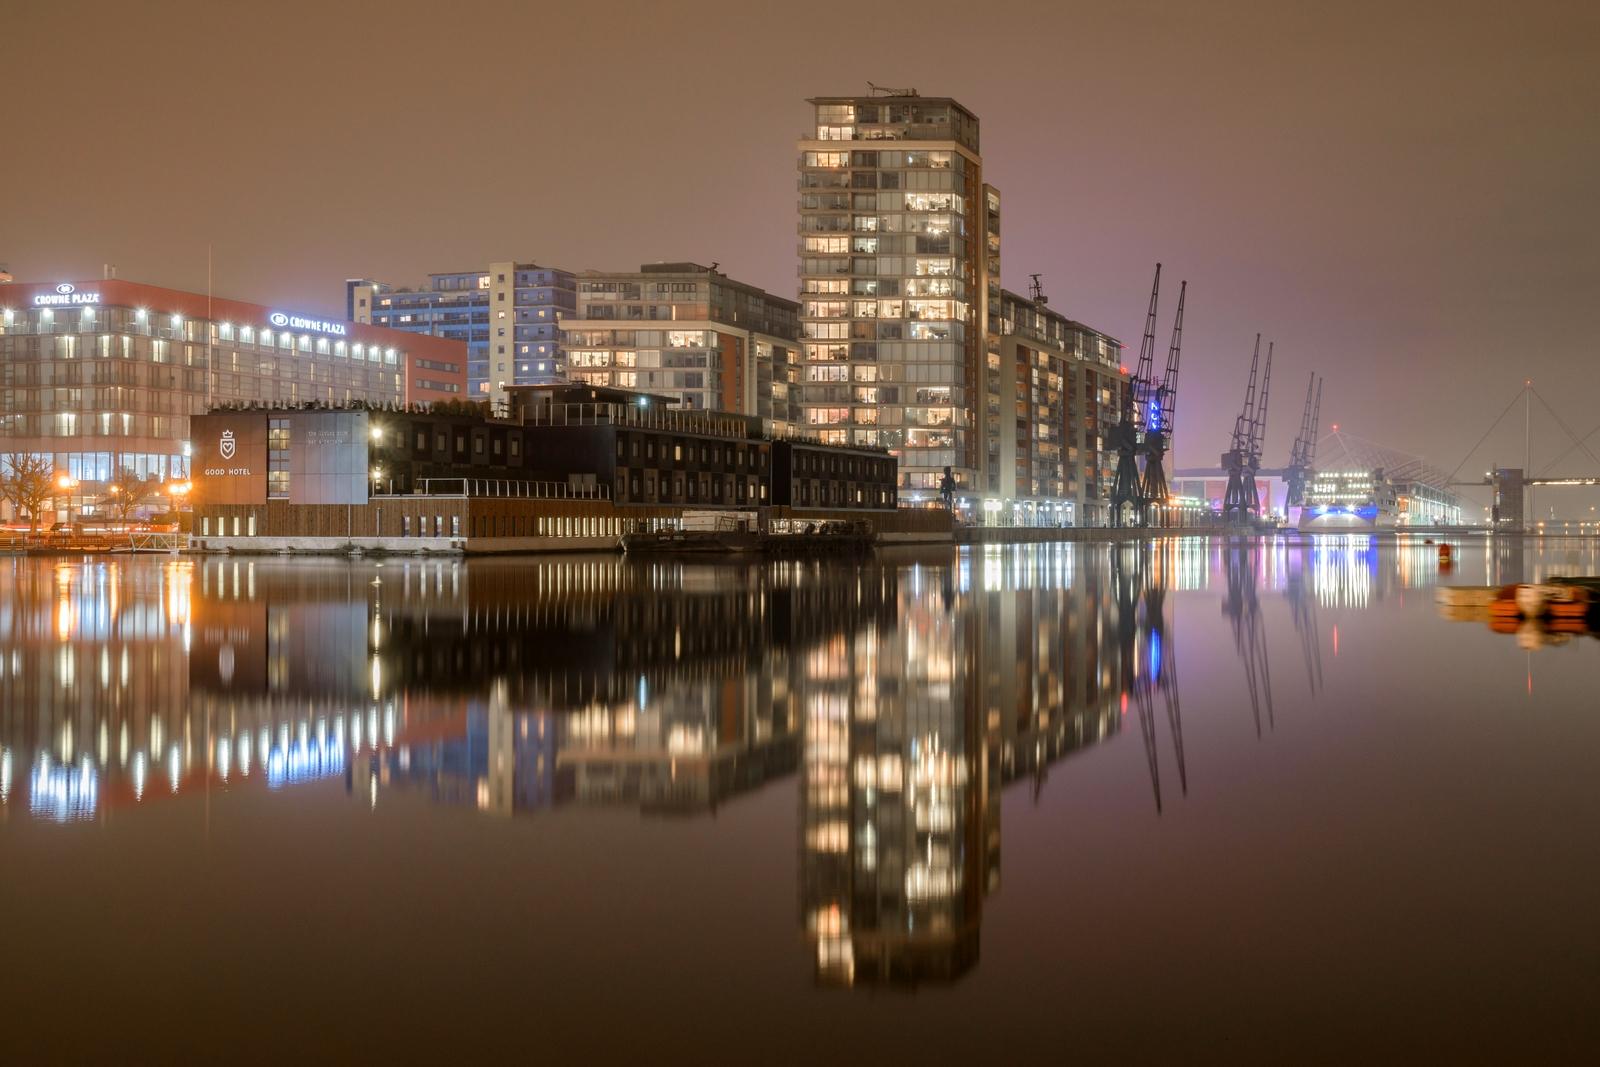 Royal Victoria Dock, United Kingdom